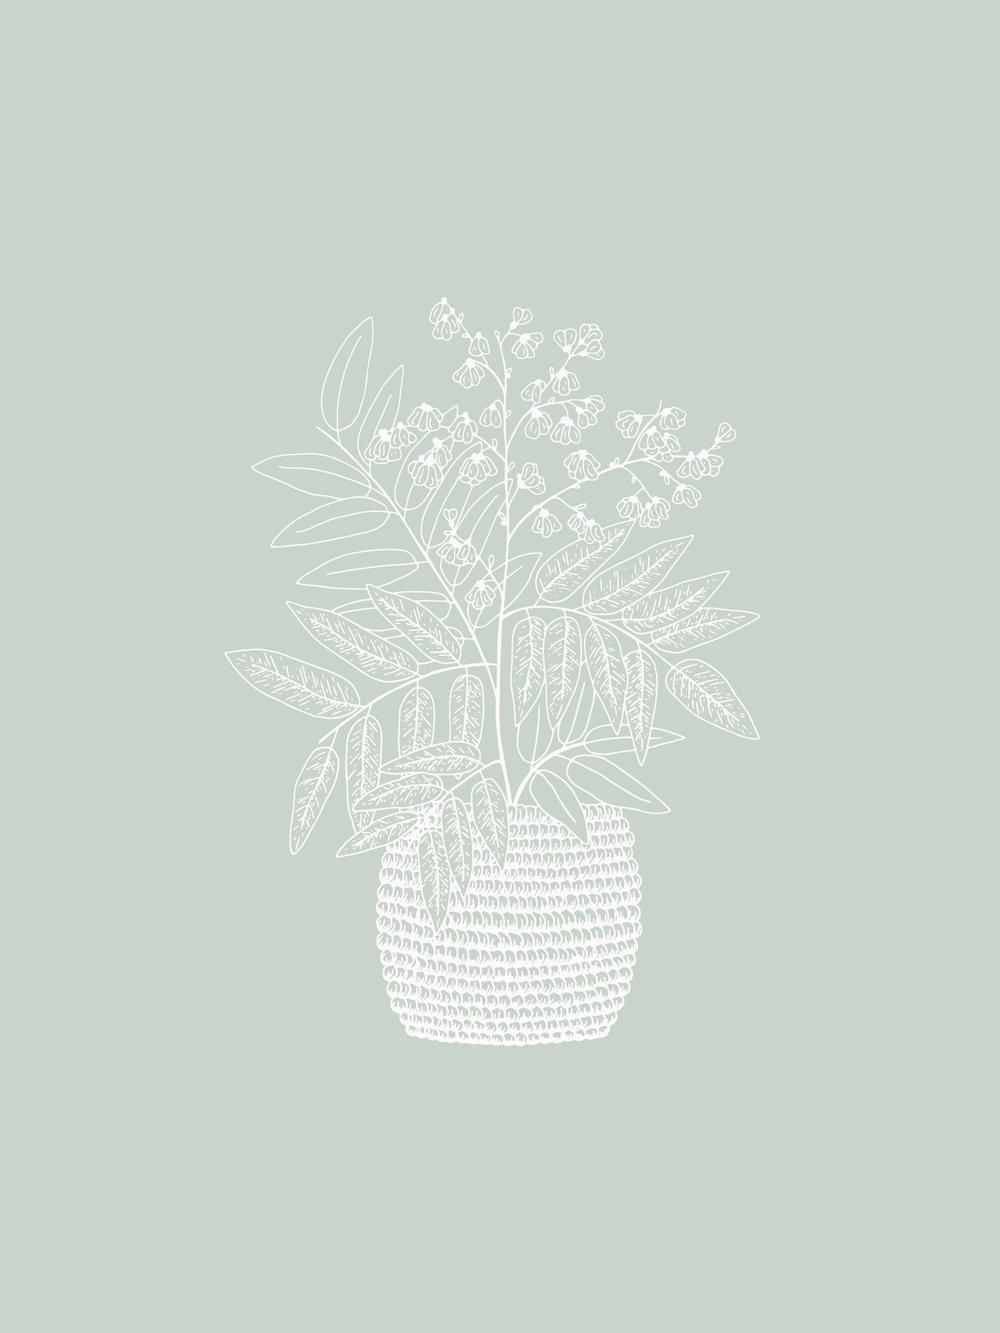 Bea & Bloom Creative Design Studio - 52 Weeks of Plants Illustration